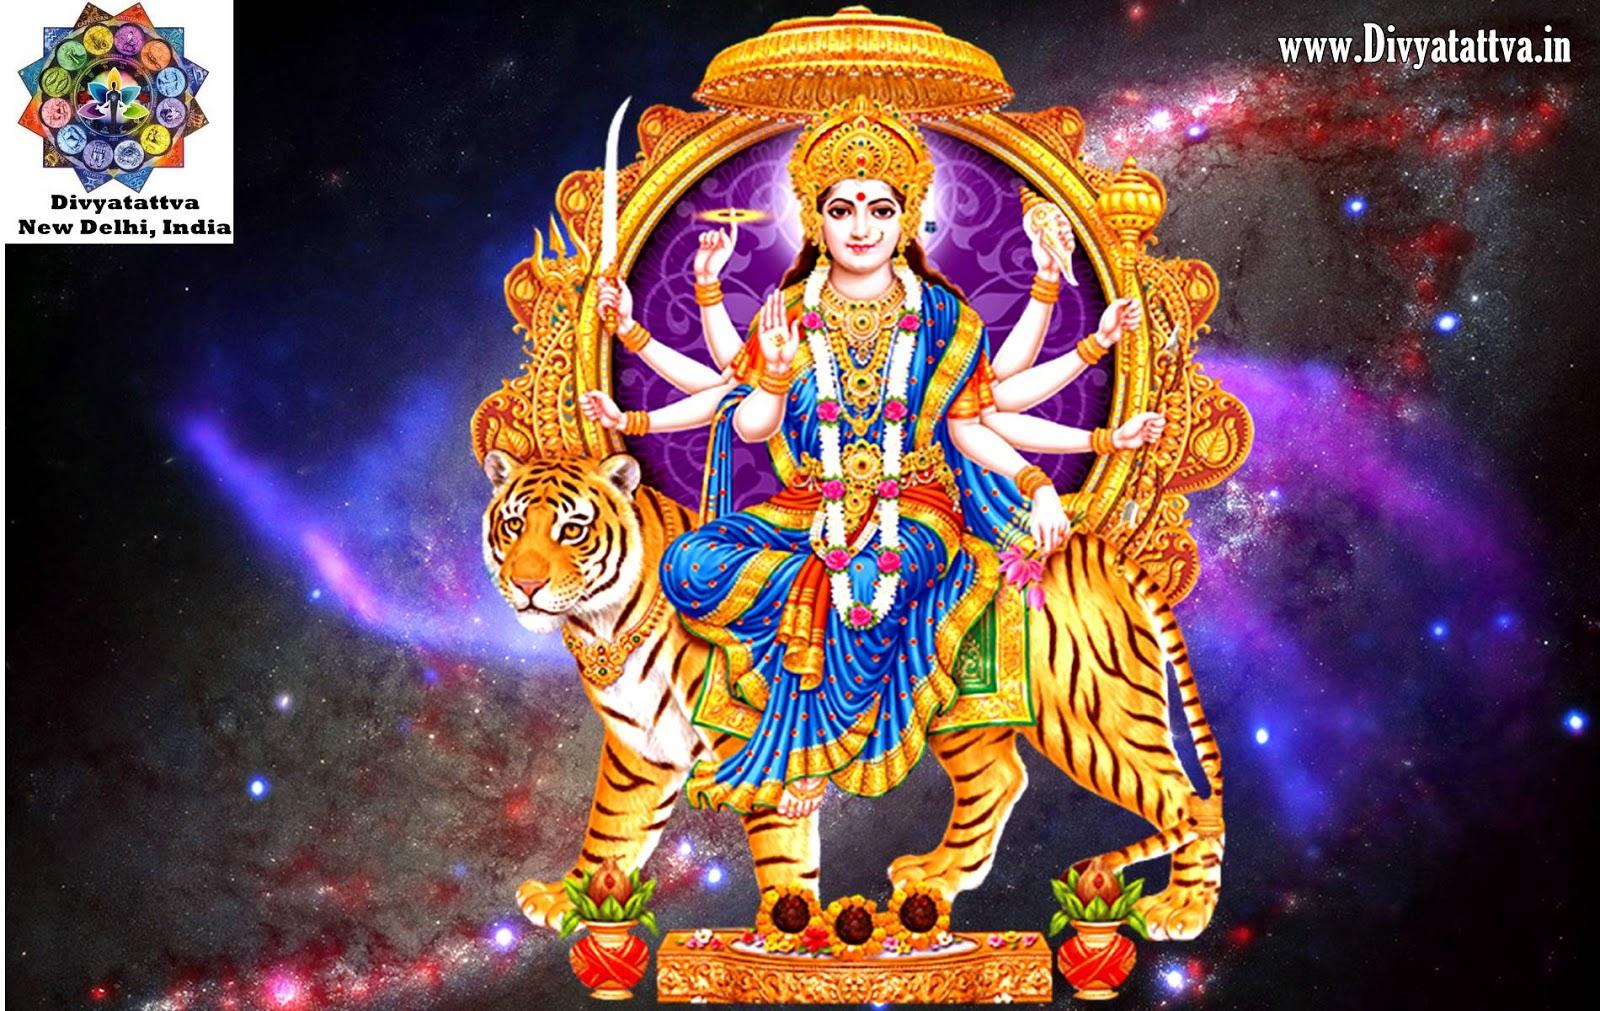 Durga Goddess Hindu Gods Devi Durga Shakti Durga Maa Durga Images Png 1600x1011 Wallpaper Teahub Io